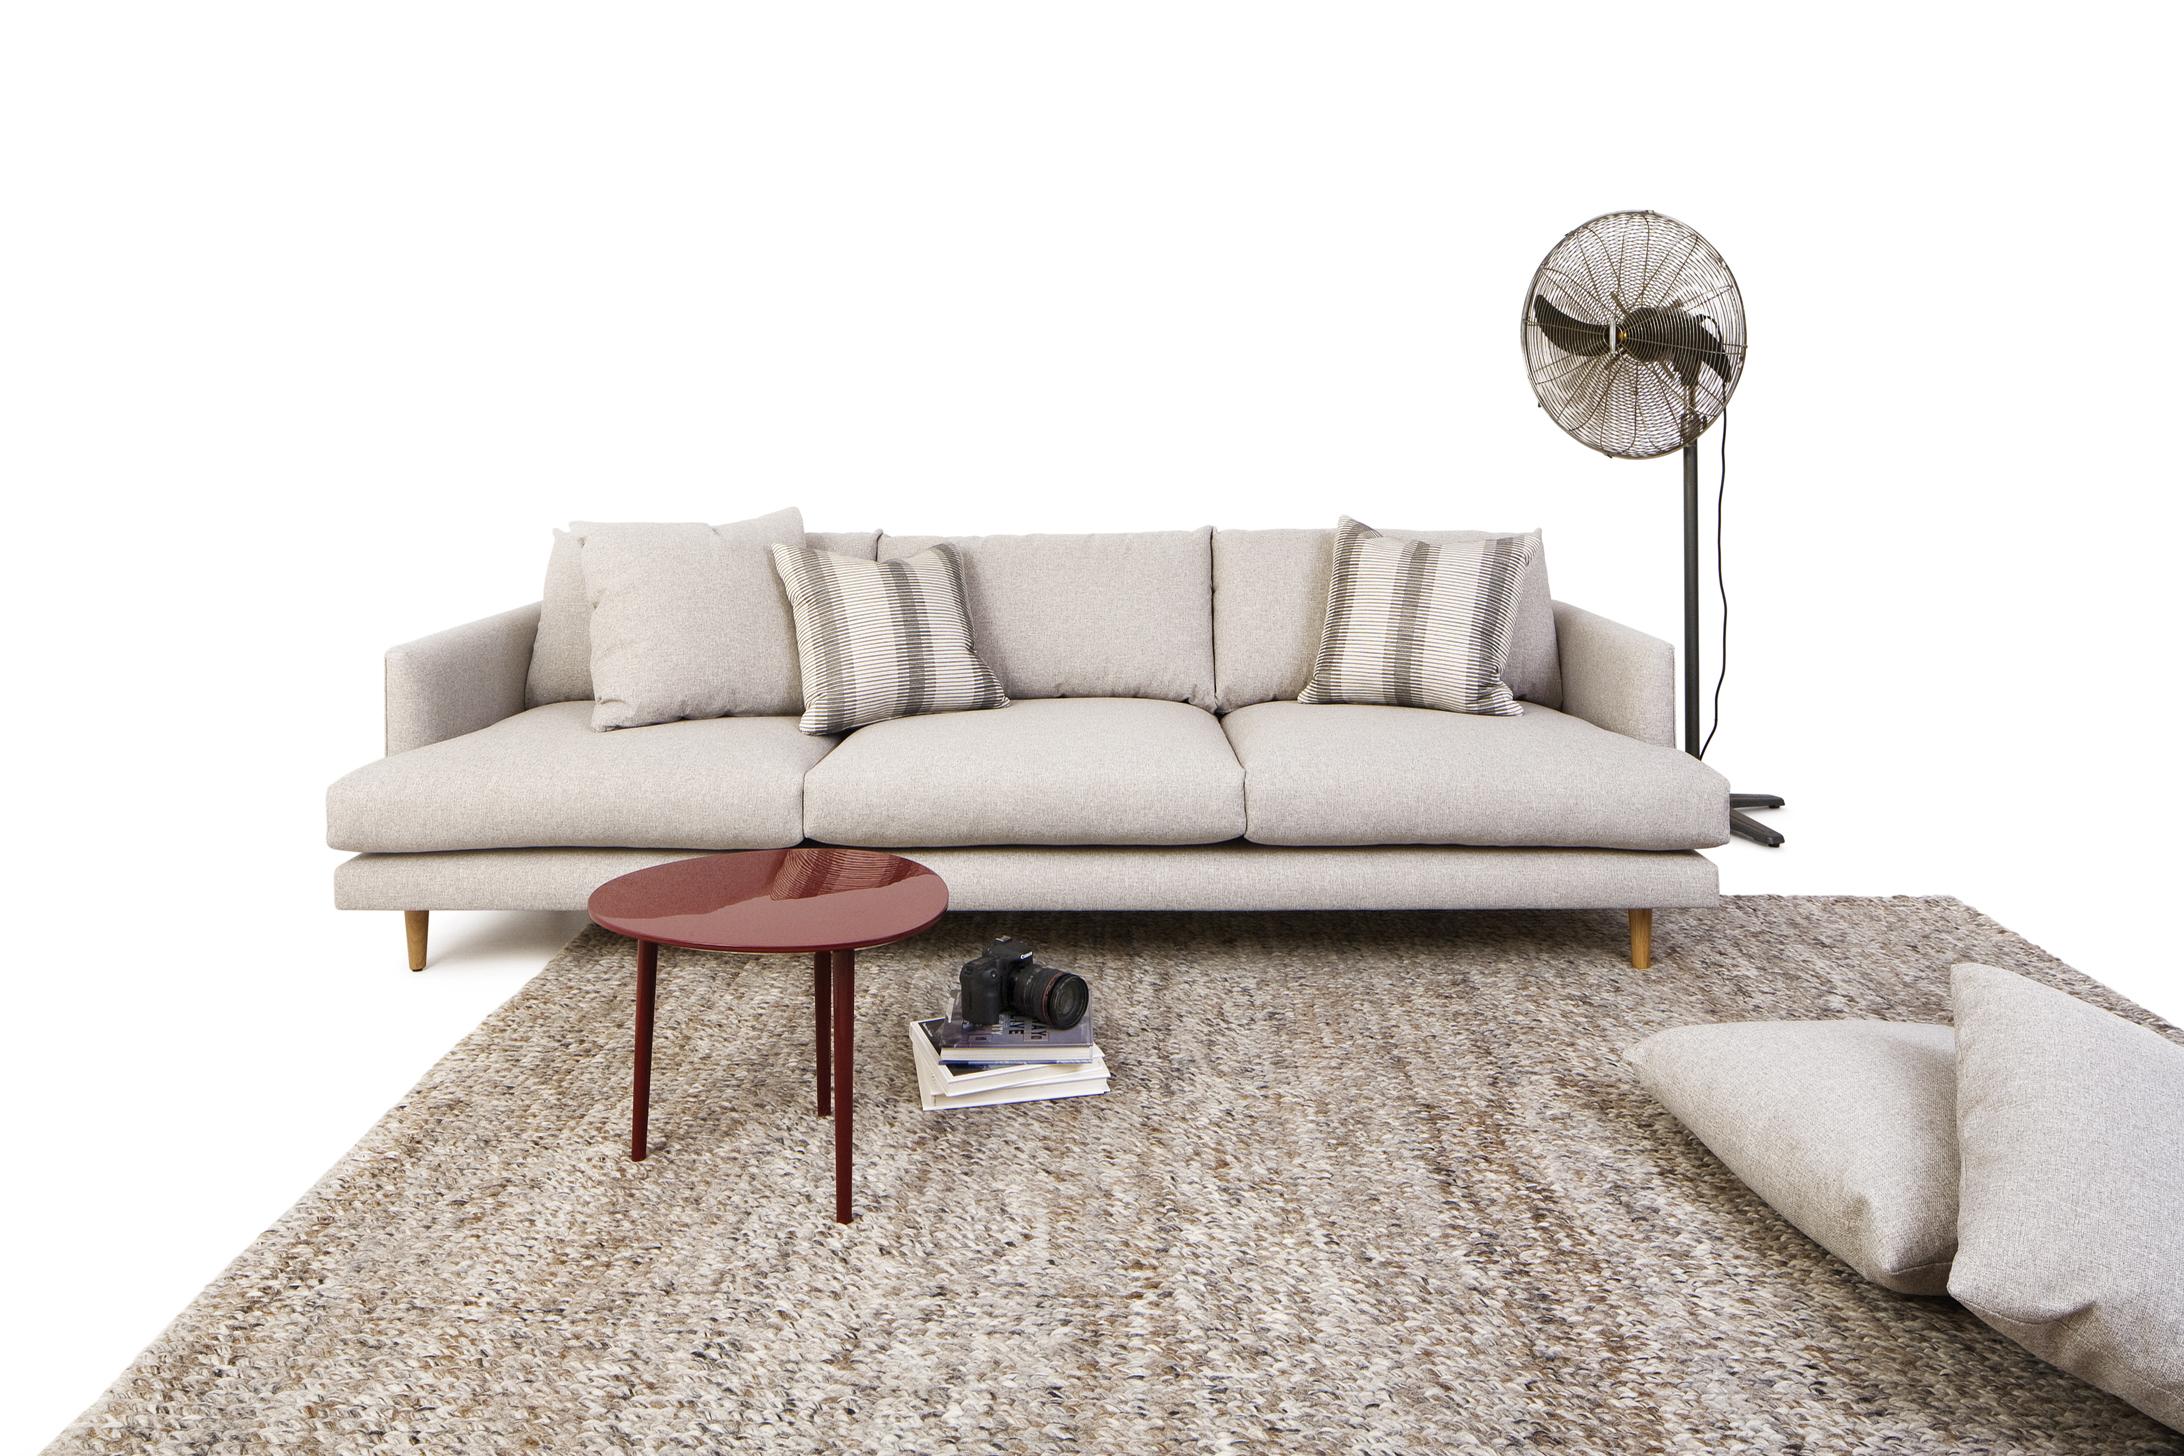 outdoor sofa covers australia sleeper sofas walmart frankie deep fanuli furniture